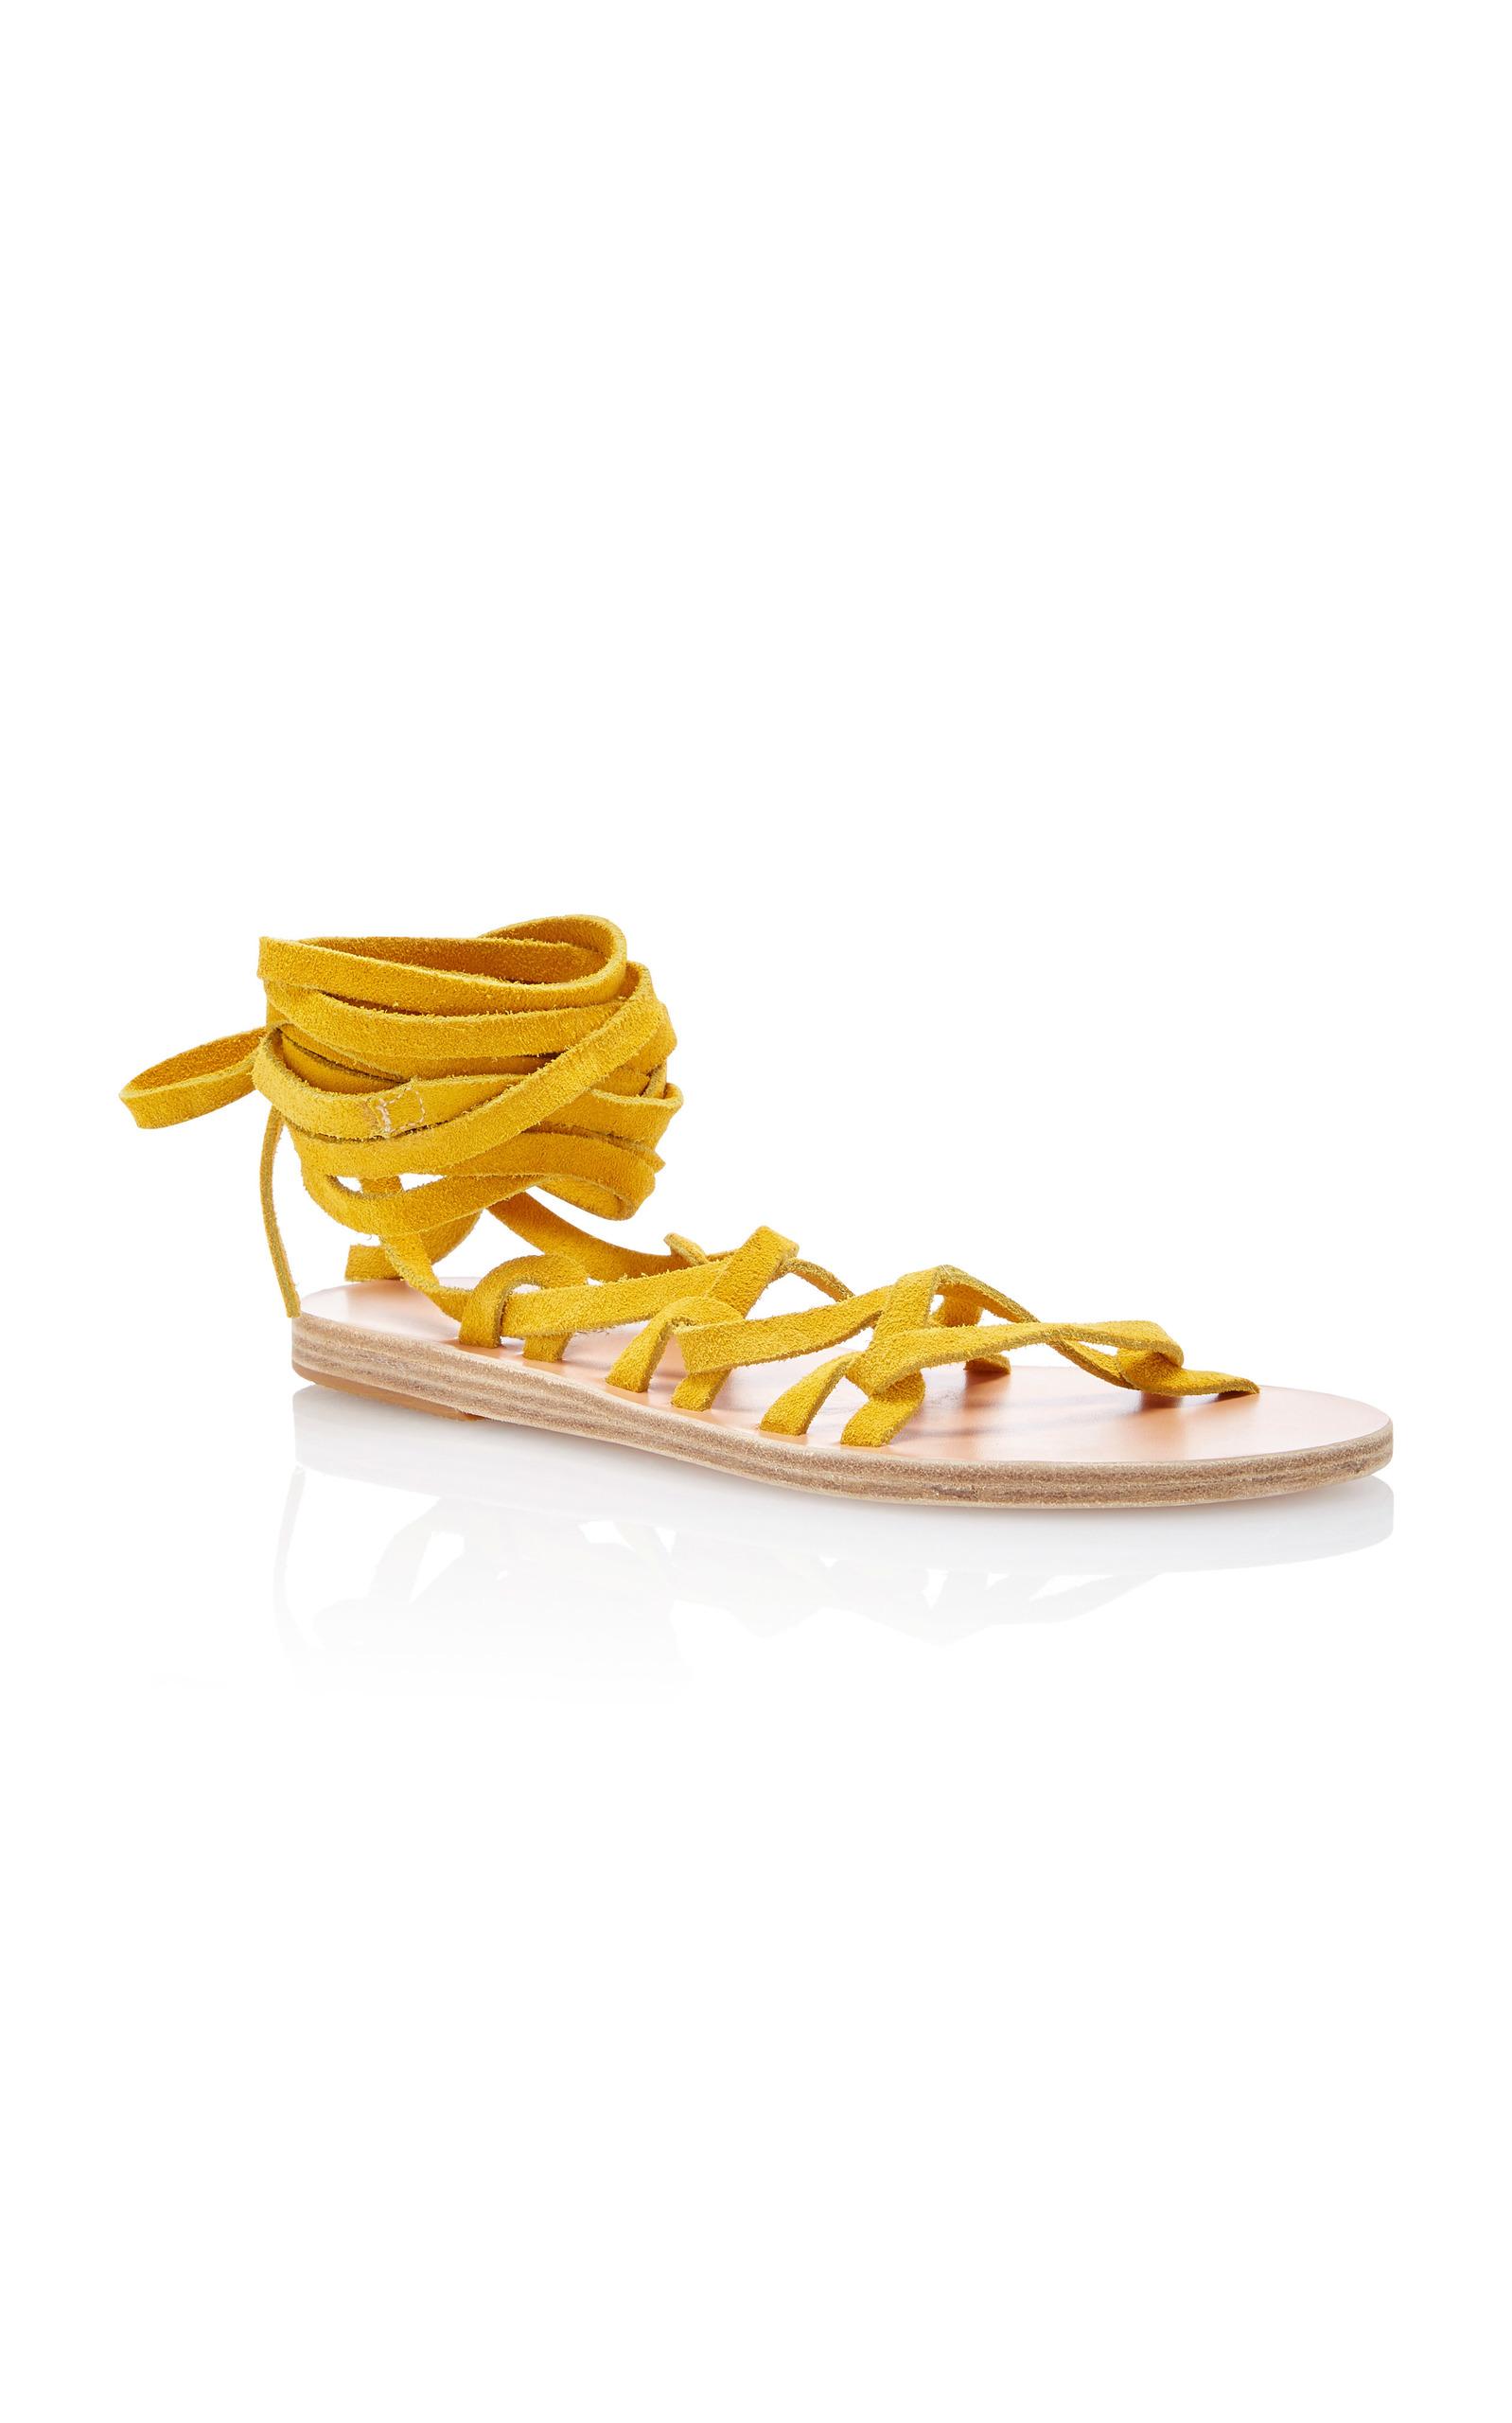 Anciennes Sandales Grecques Cravate Simplement Sandales Kariatida - Jaune Et Orange 7J8jol3grZ